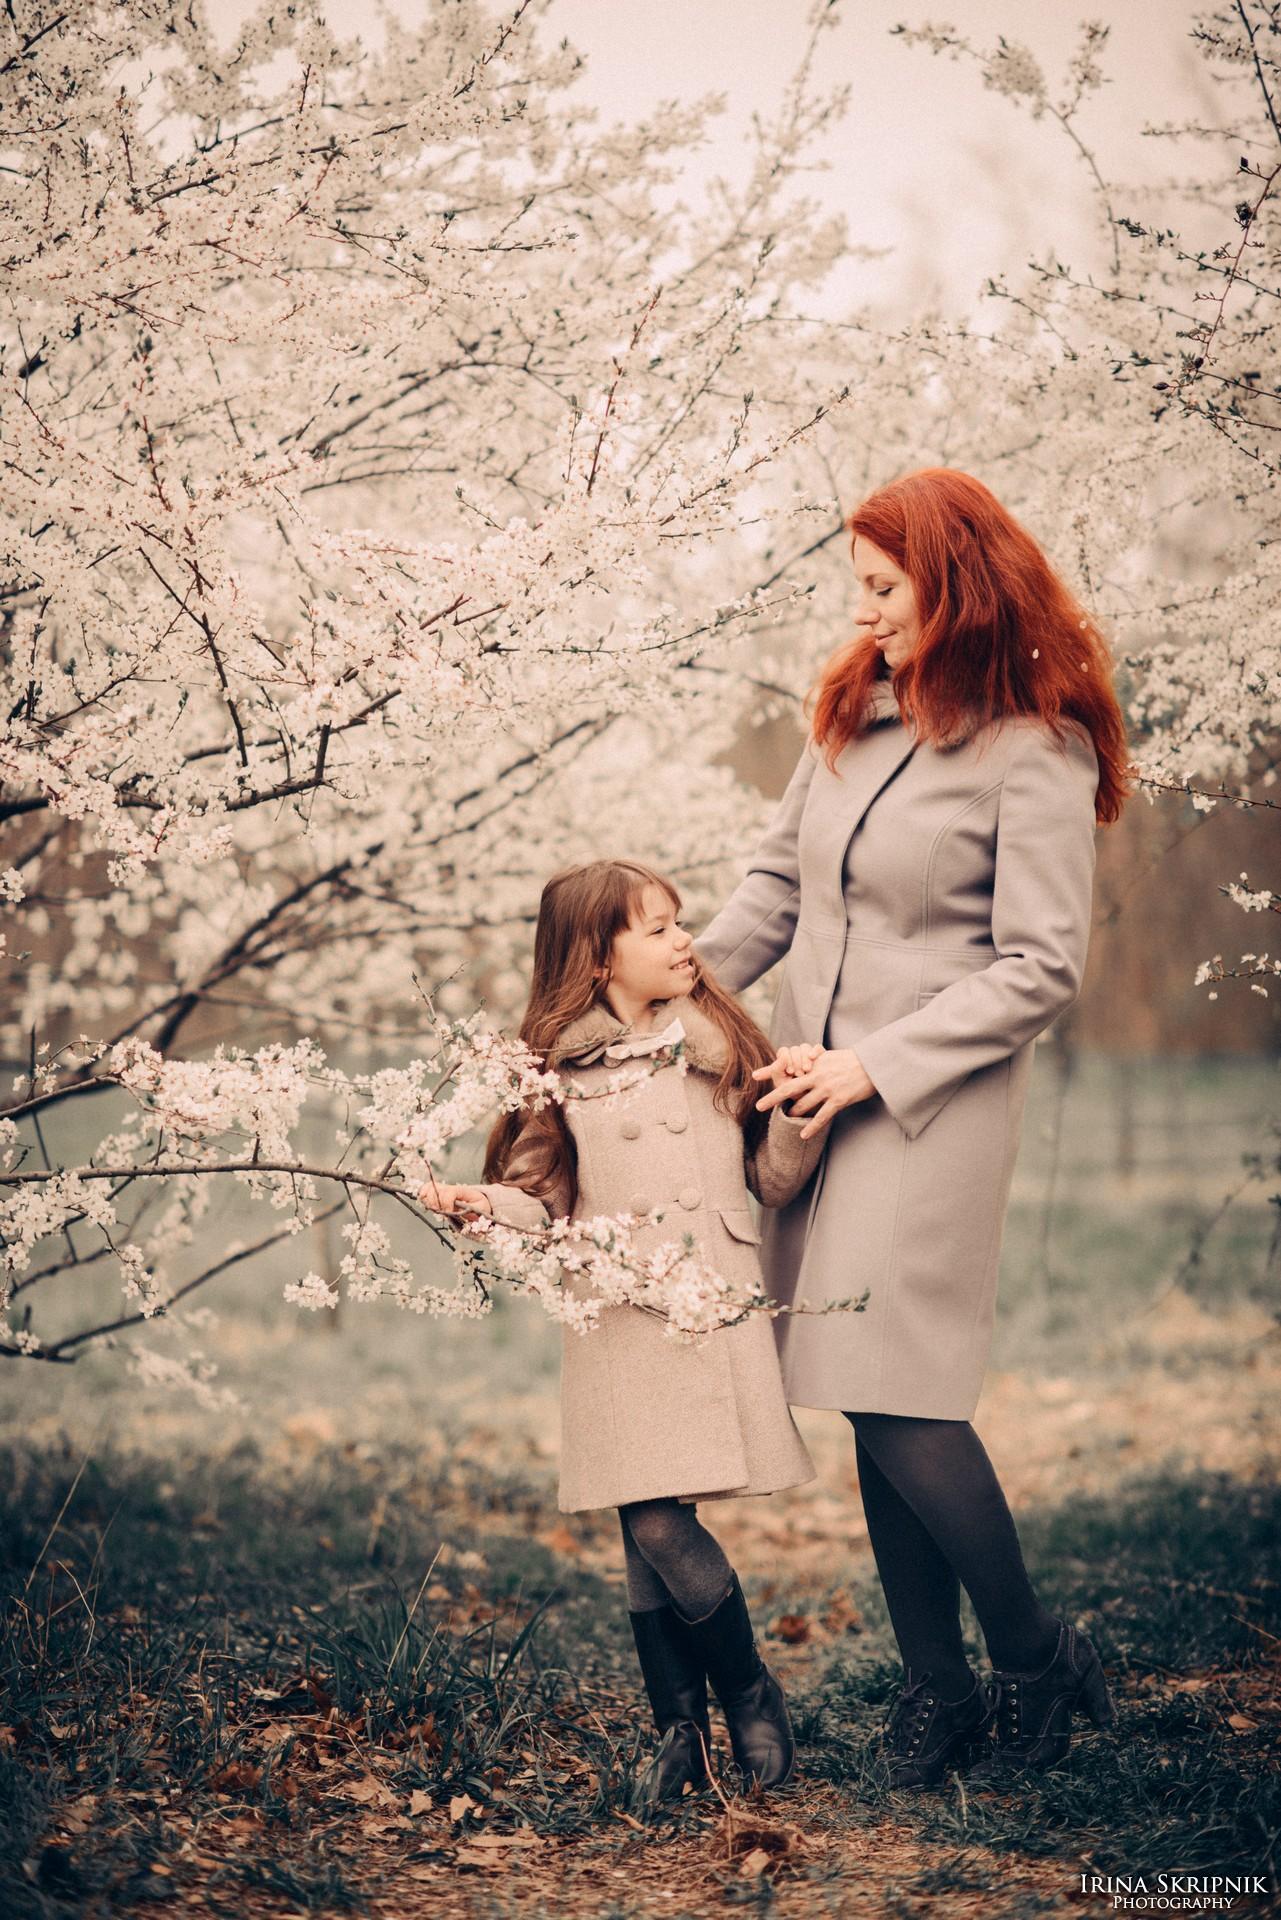 Irina Skripnik Photography 20148